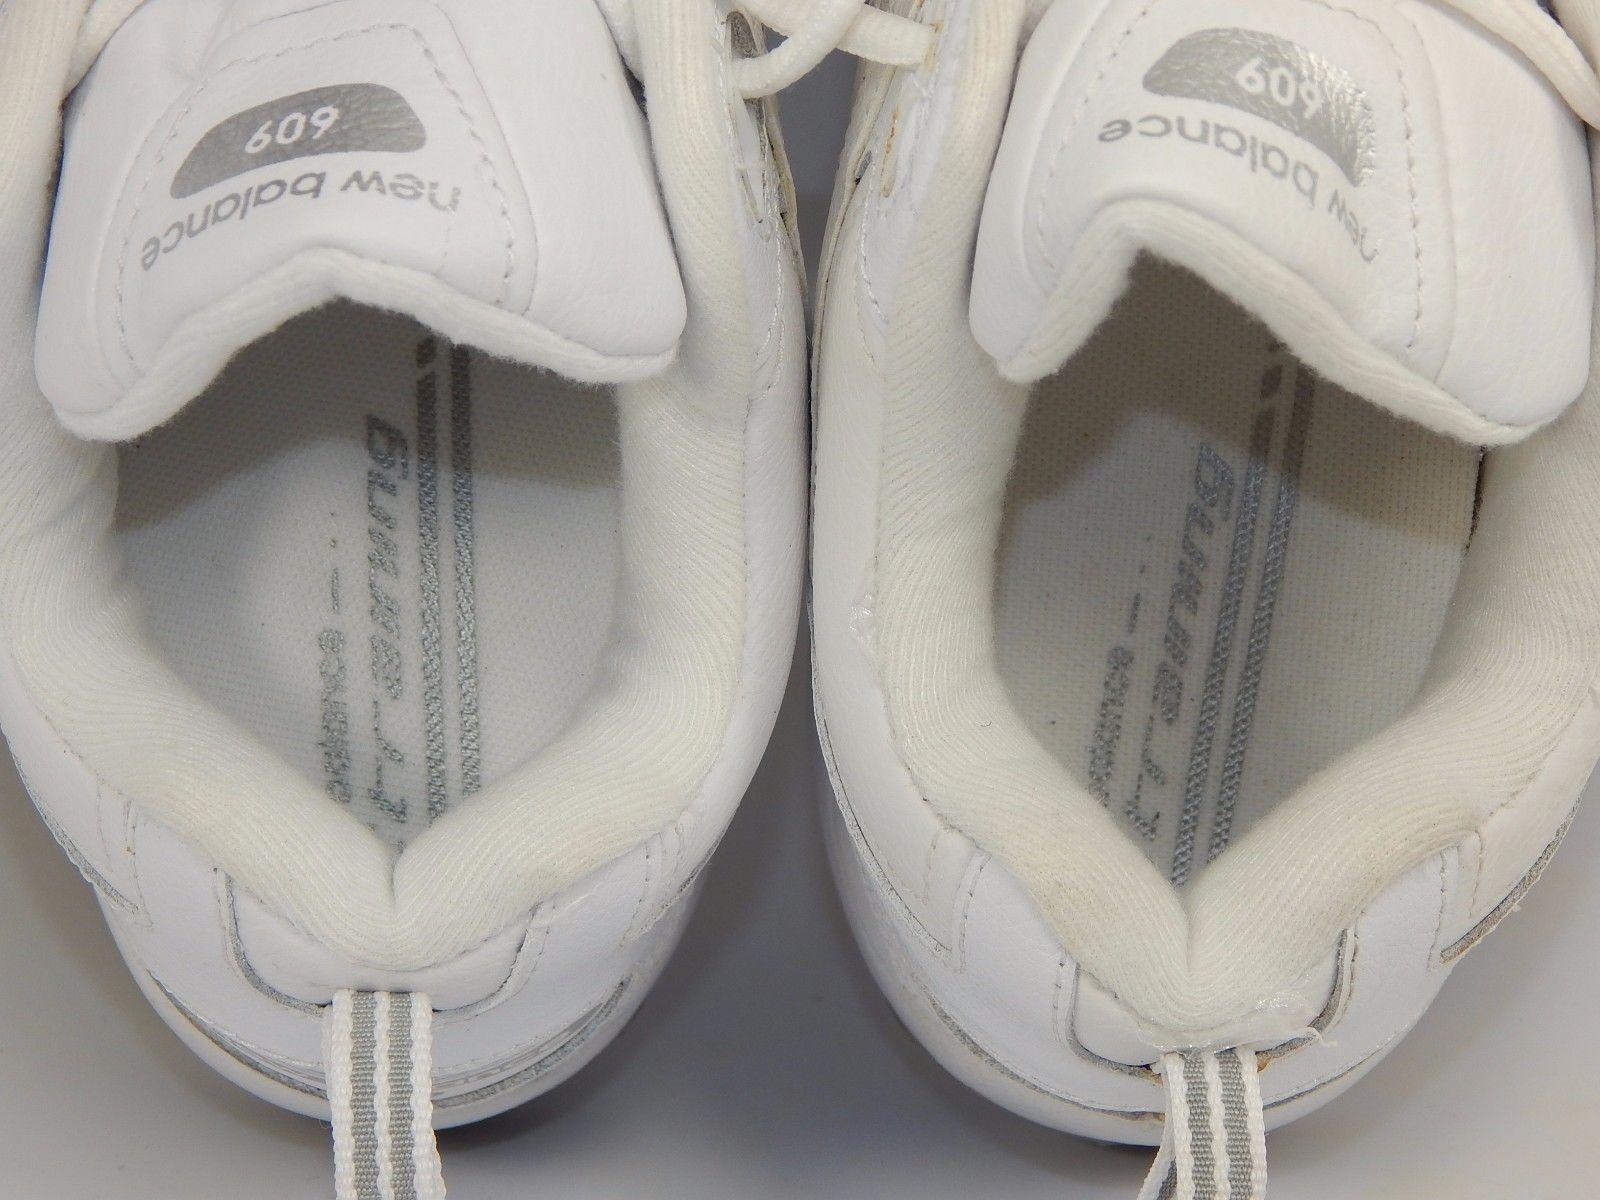 New Balance 609 v2 Men's Training Shoes Size US 9 M (D) EU 42.5 White MX609V2A